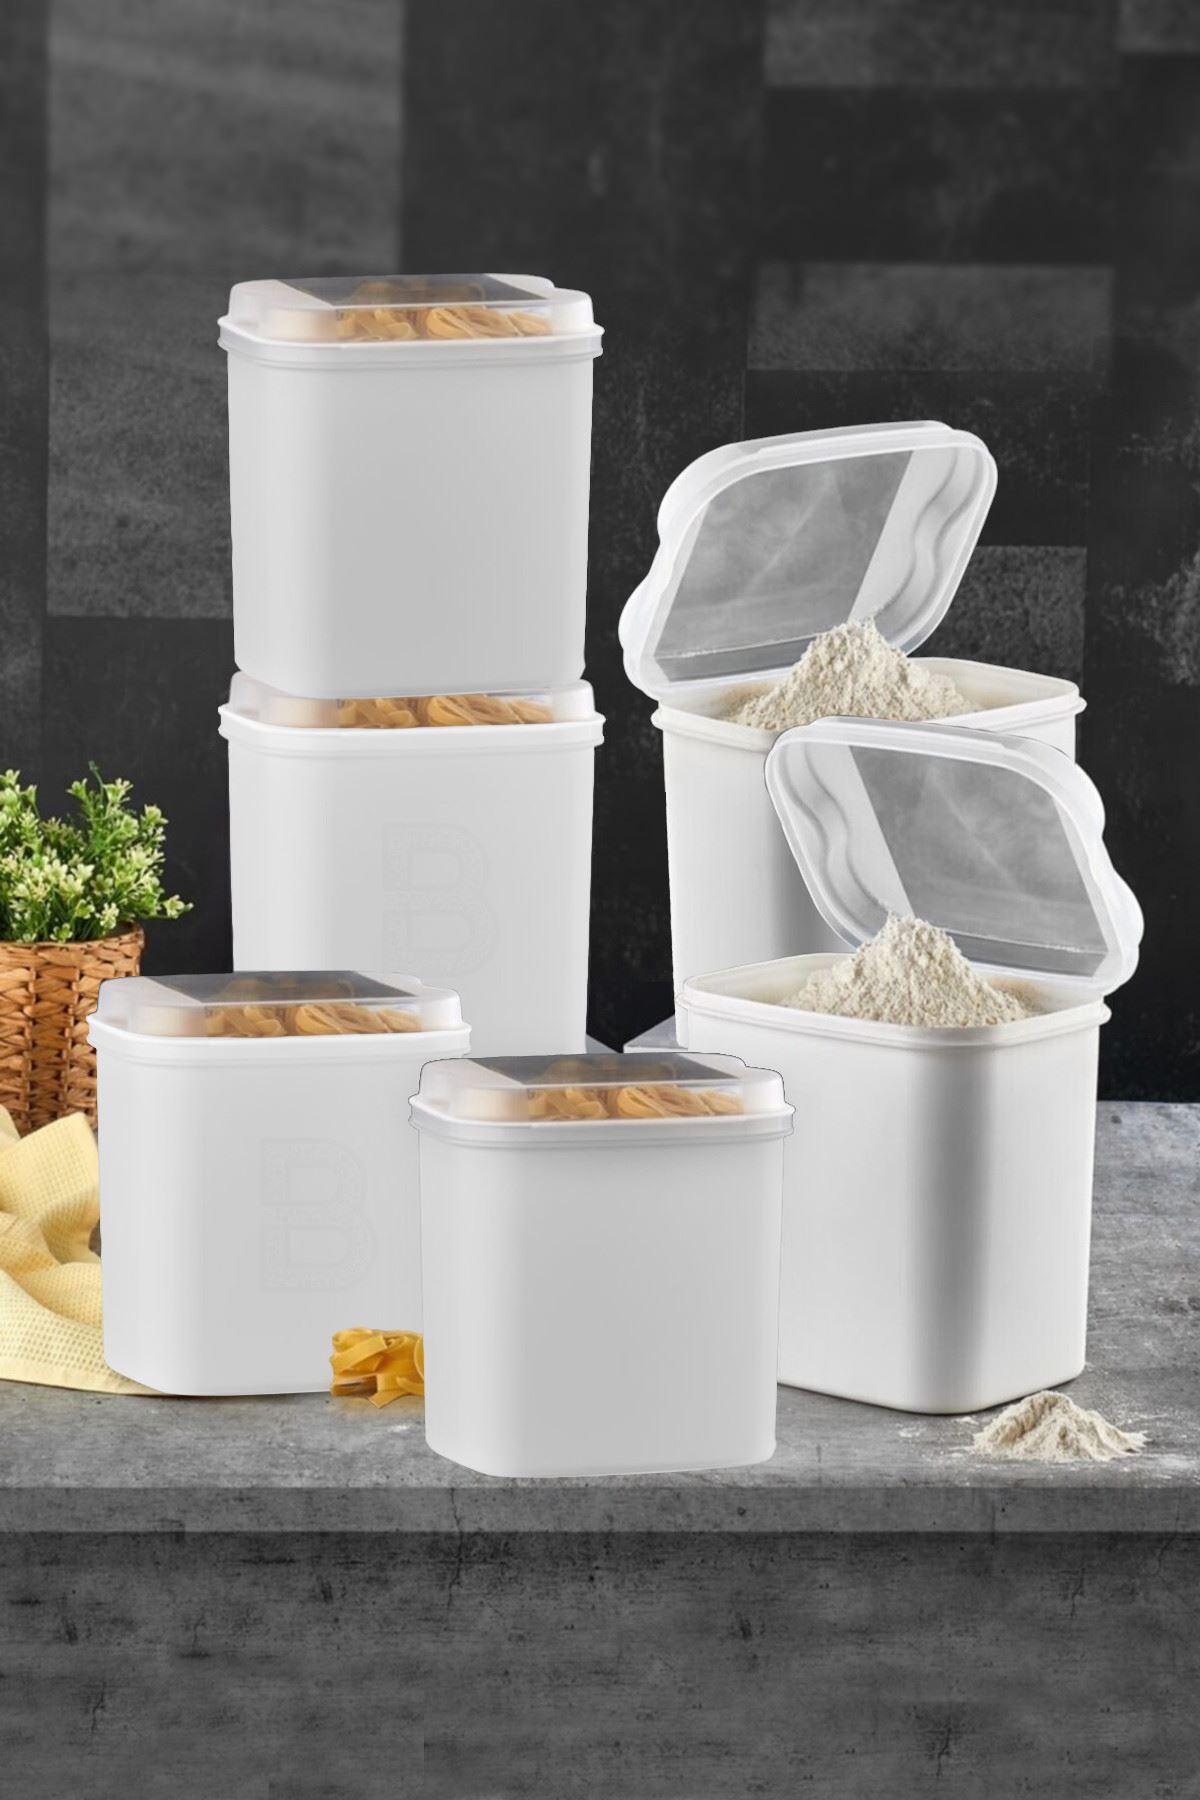 Kitchen Trend 6 LI Un ve Bakliyat Kabı 4,5 Litre Beyaz